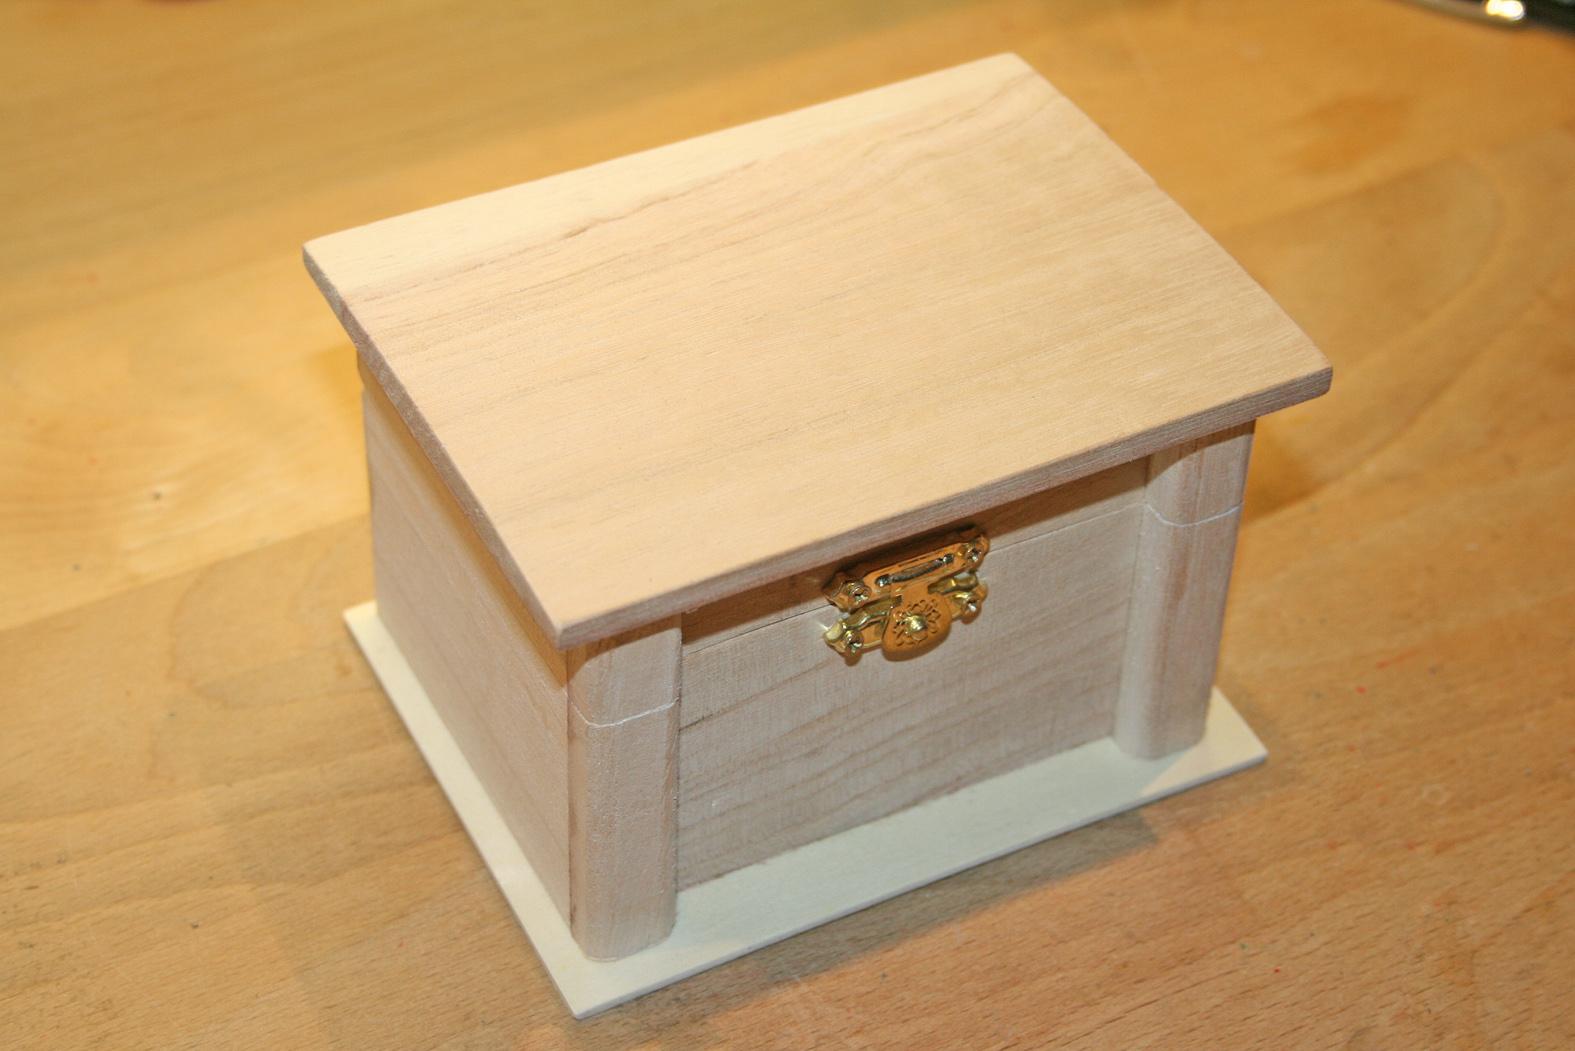 gabriele s conga crafts blog geldgeschenk schatzkiste. Black Bedroom Furniture Sets. Home Design Ideas